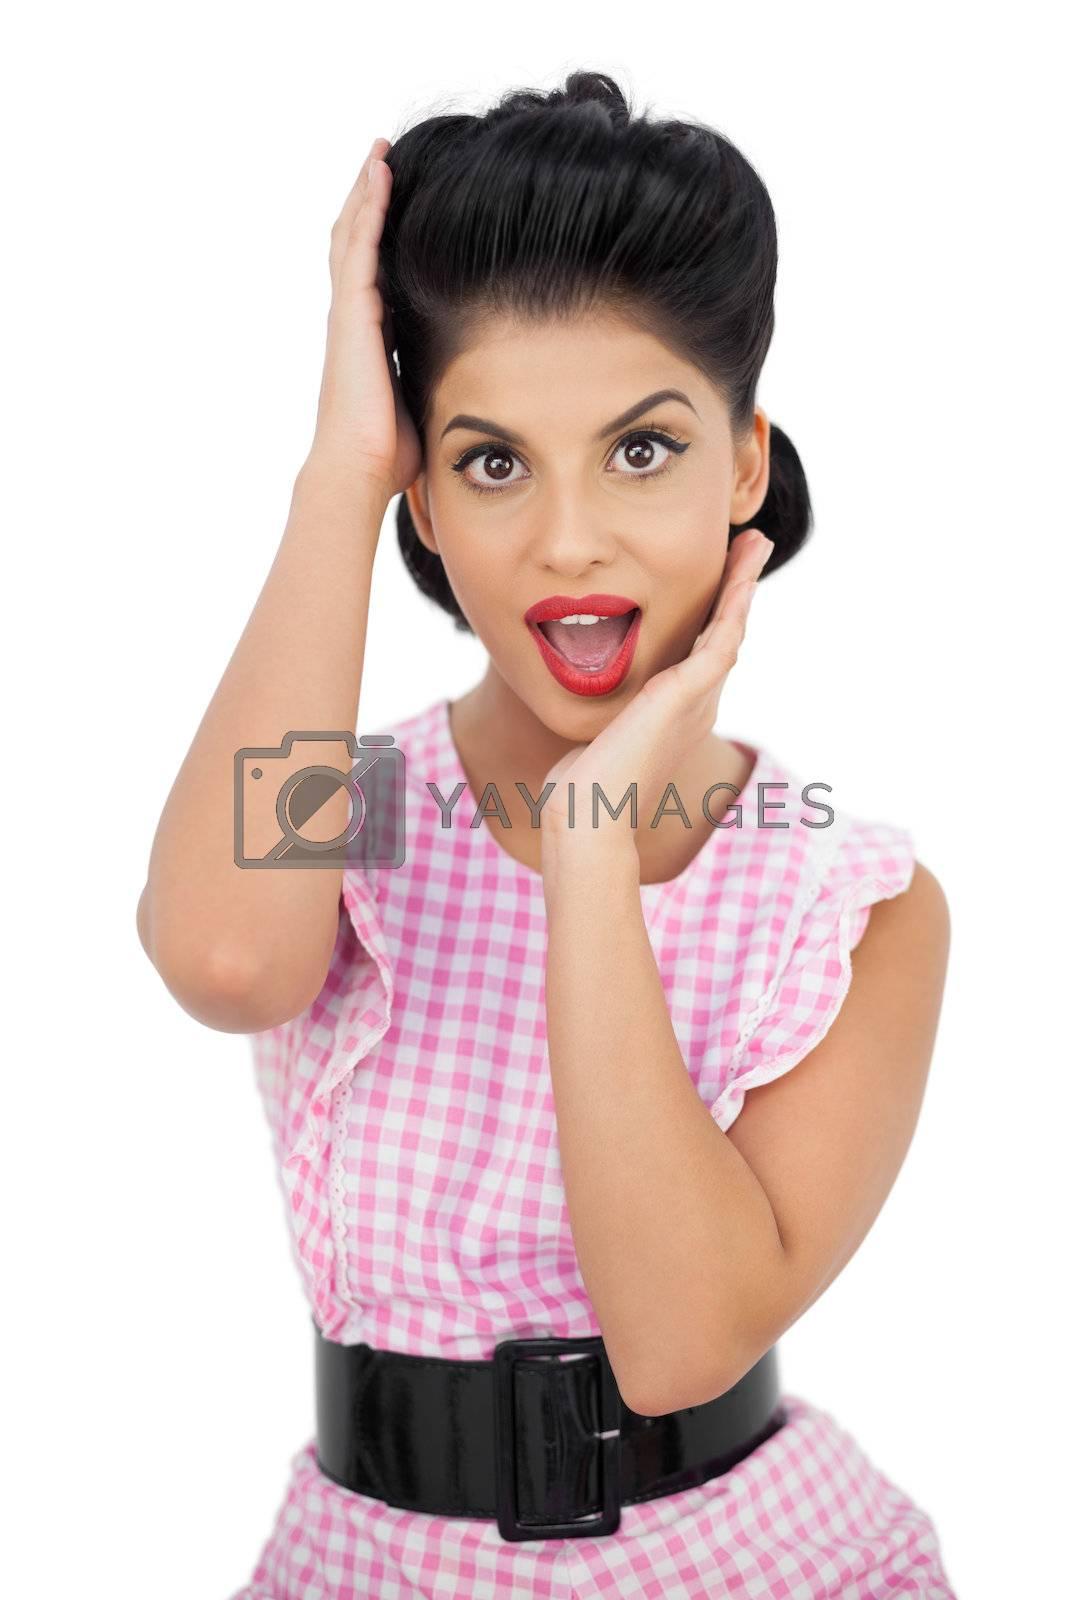 Stylish black hair model looking at camera by Wavebreakmedia